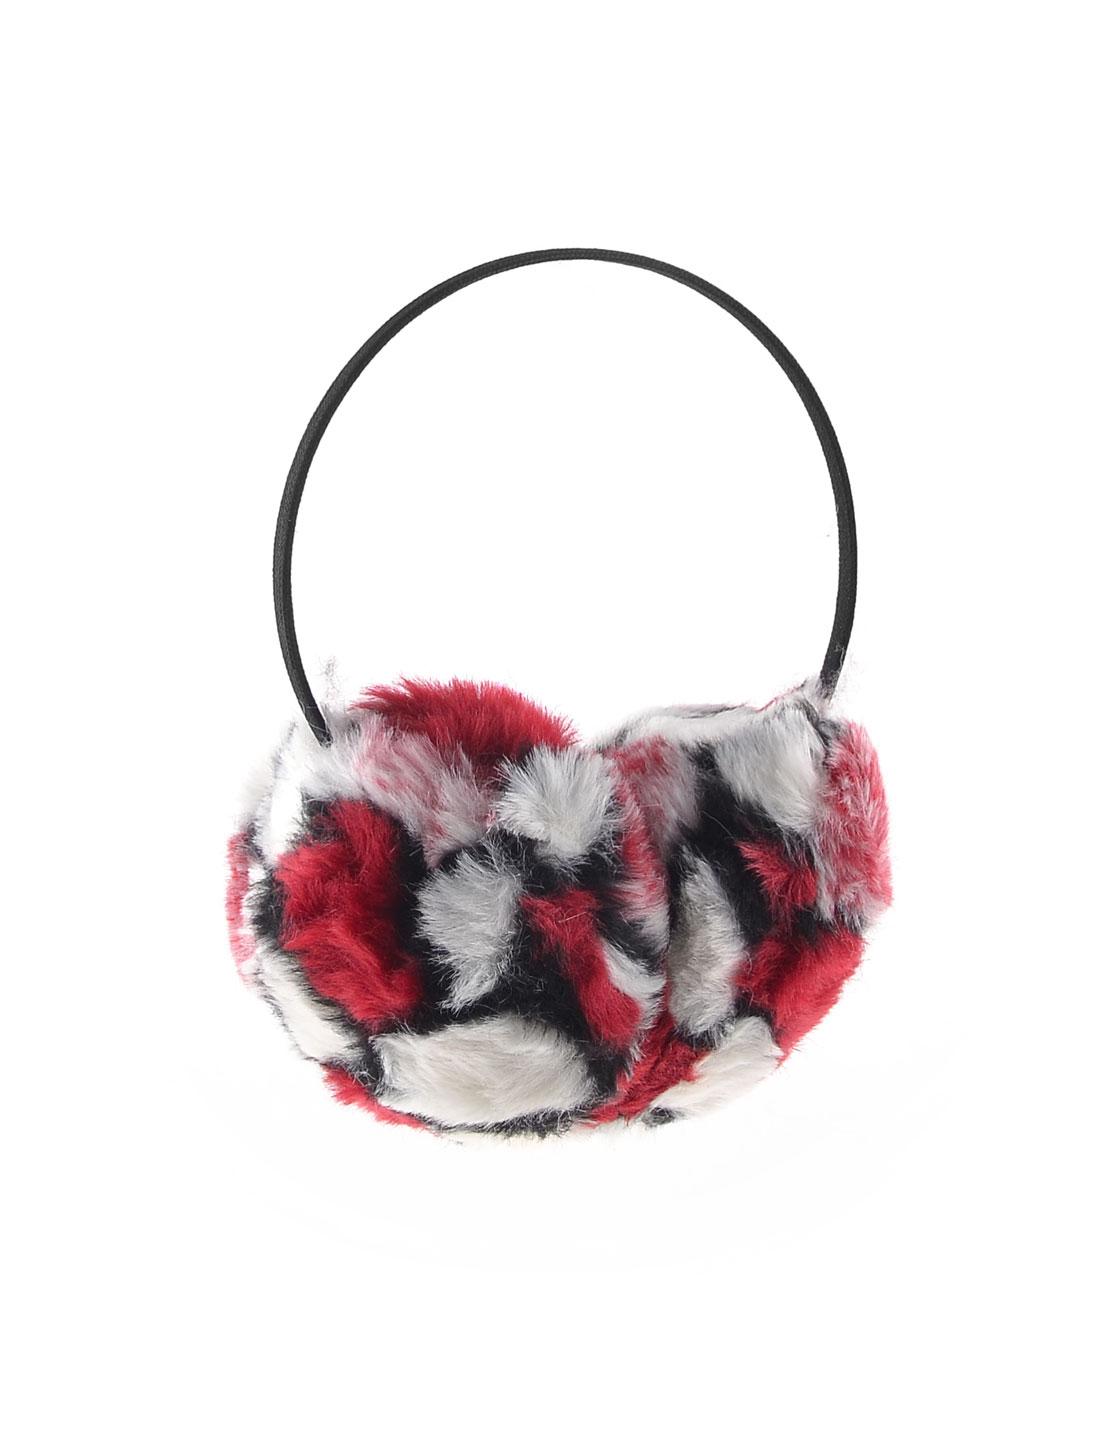 Red White Black Soft Plush Ear Winter Warmer Round Earmuffs for Lady Man